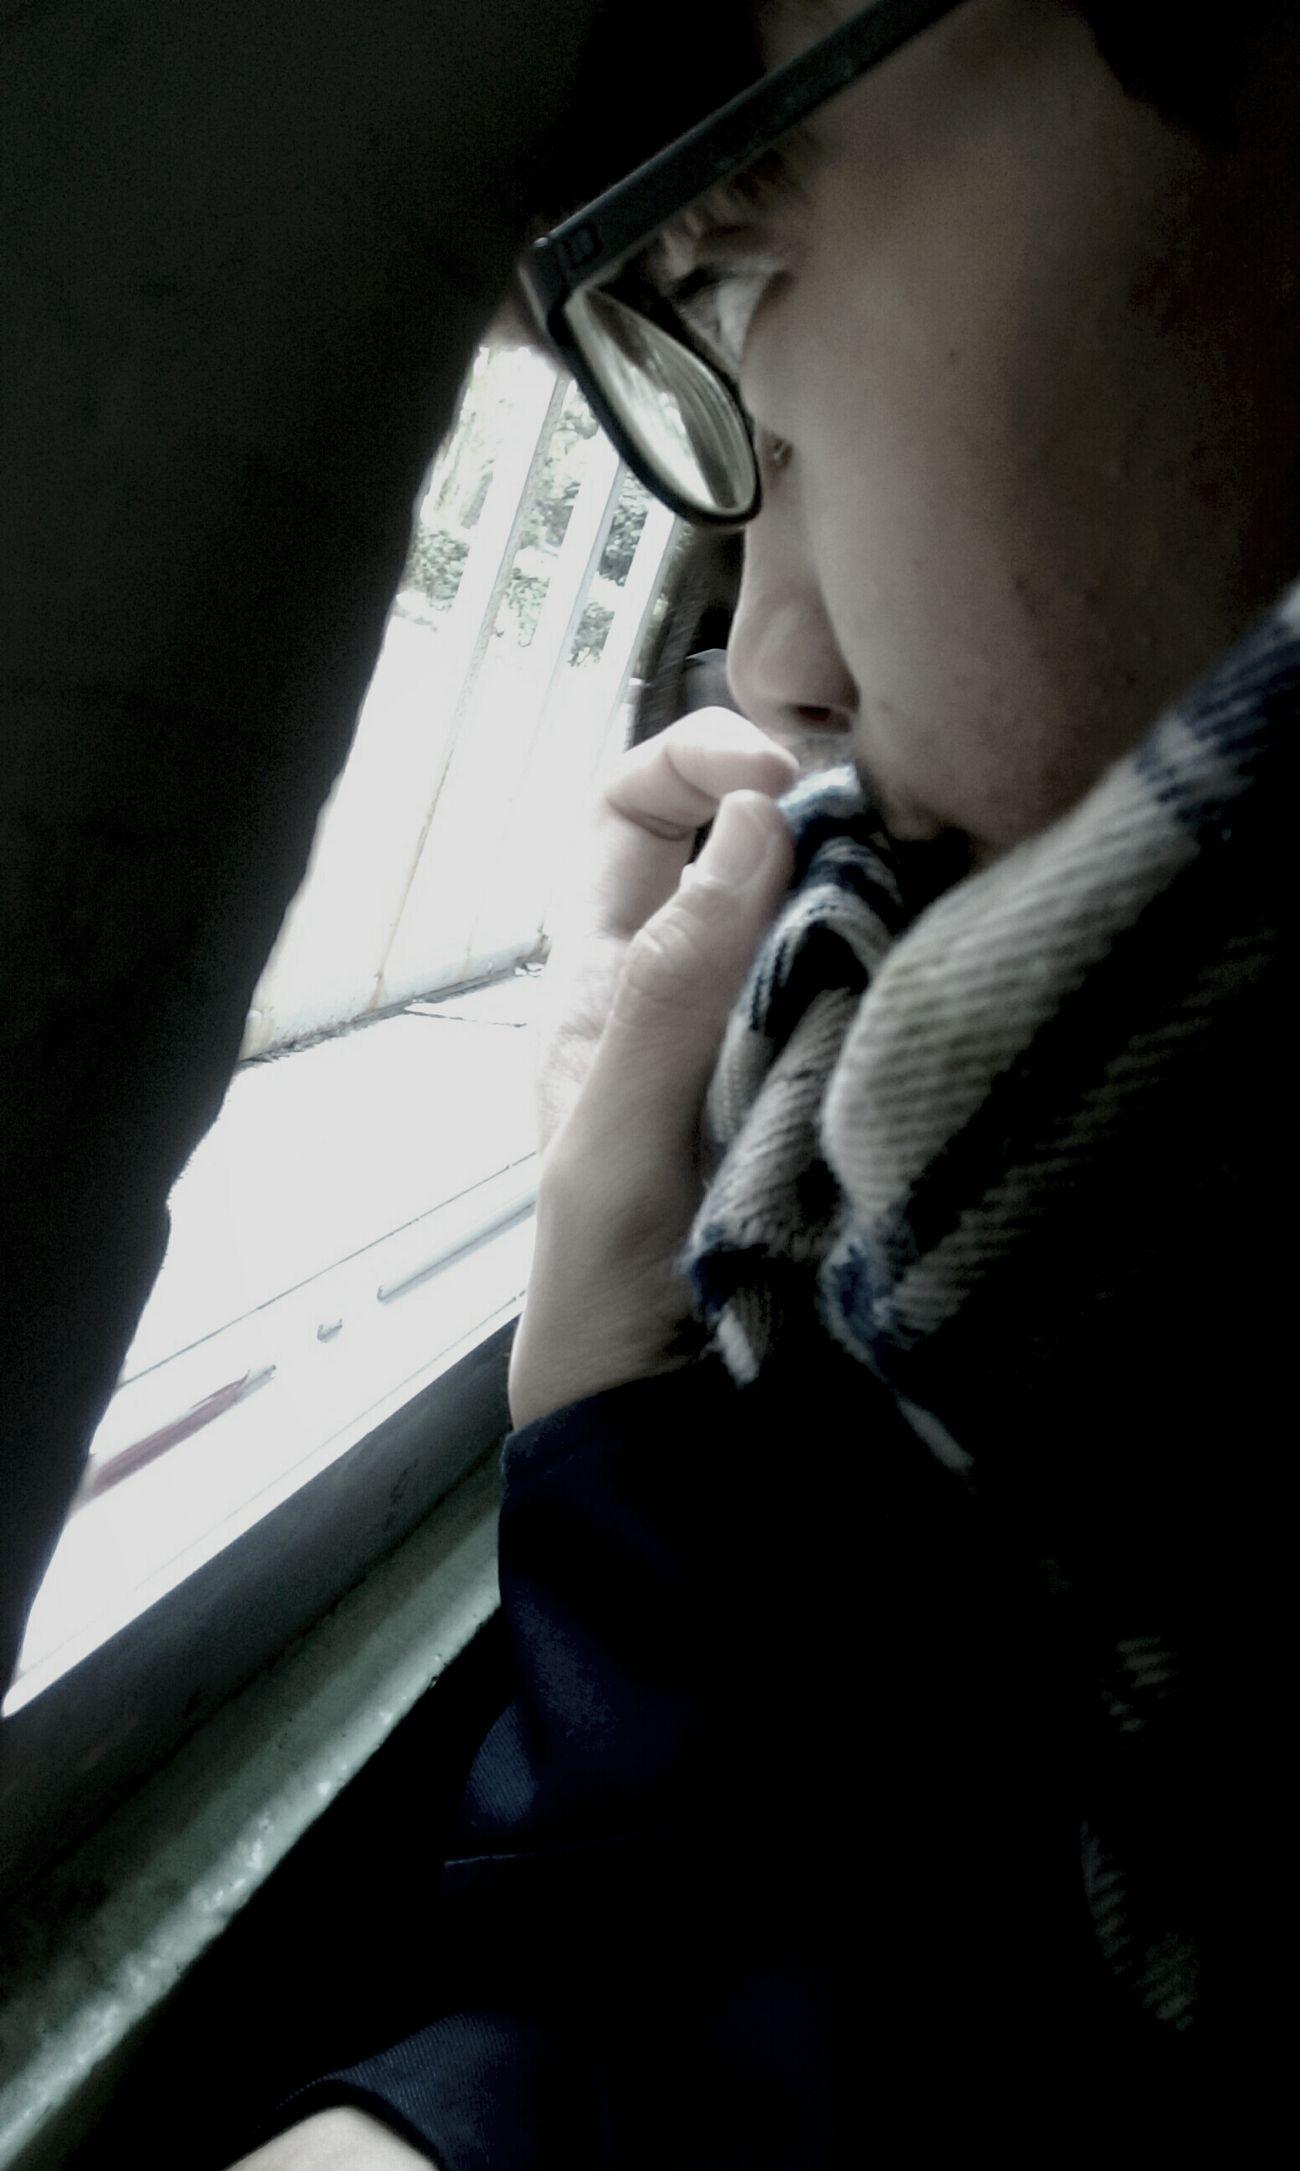 The Five Senses Enjoying Life Classmates Watching People